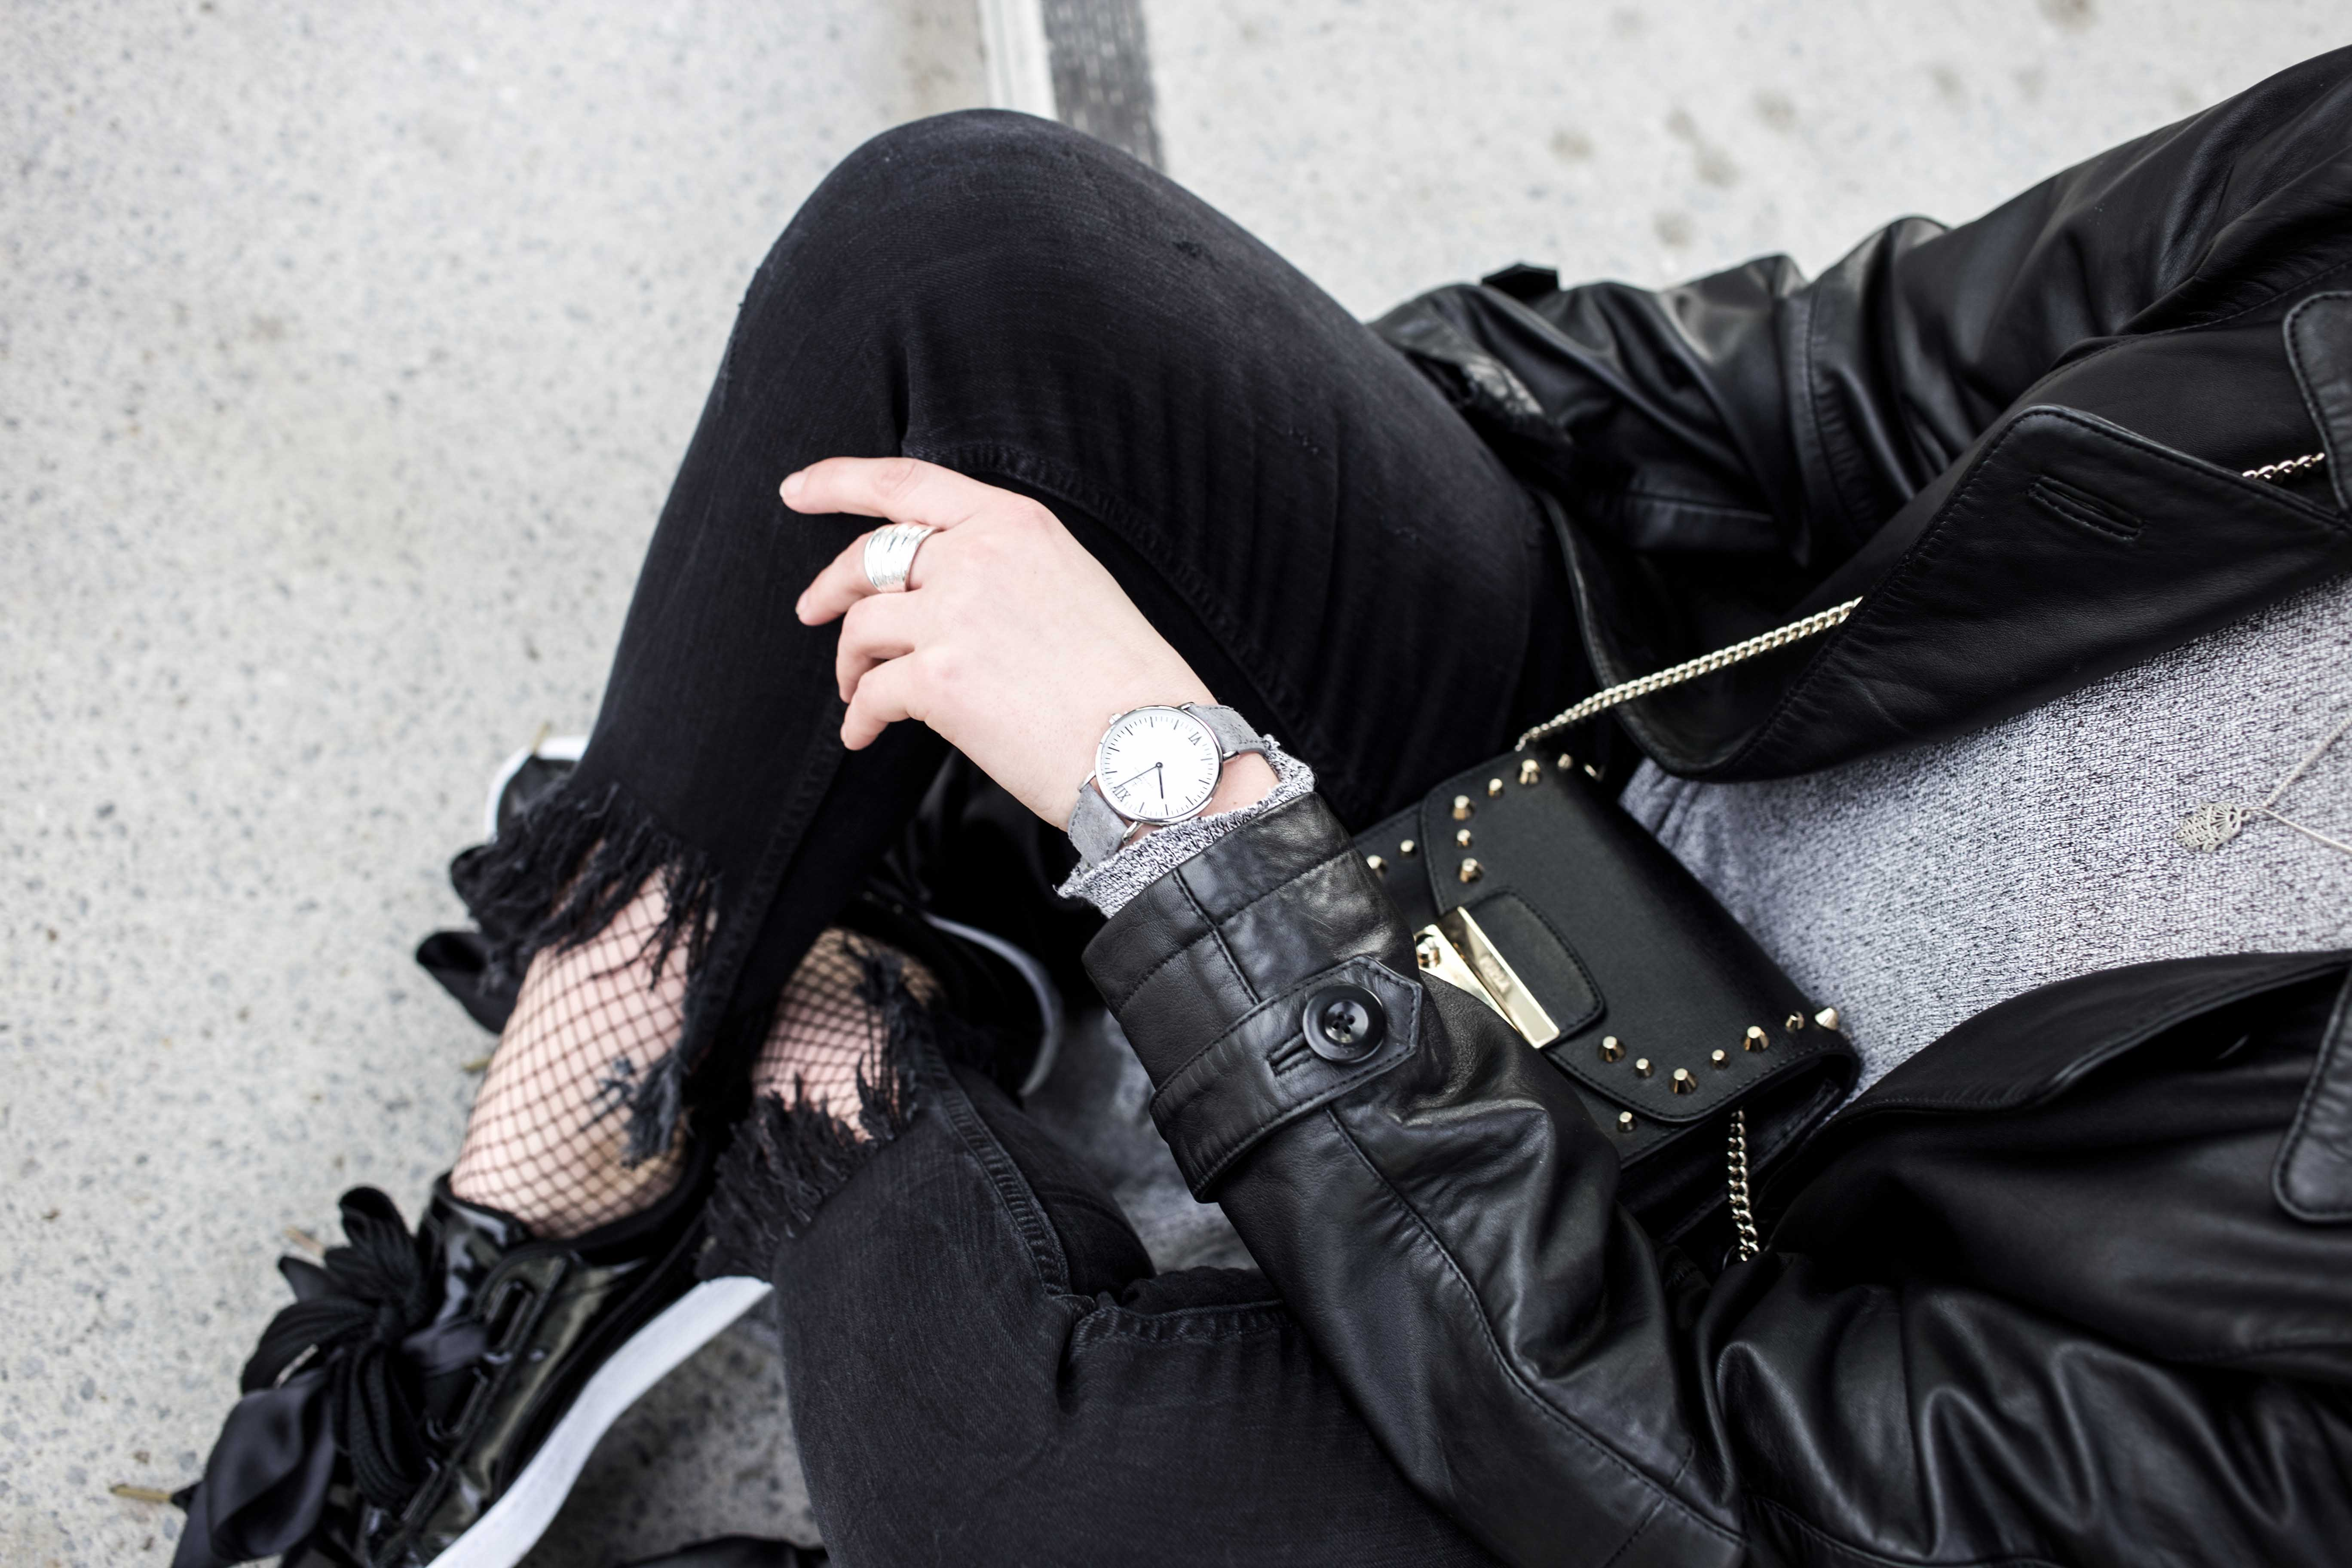 Netzstrumpfhose-kombinieren-Trend-Outfit-Fashionblog-PUMA-Basket-Ledermante_9512